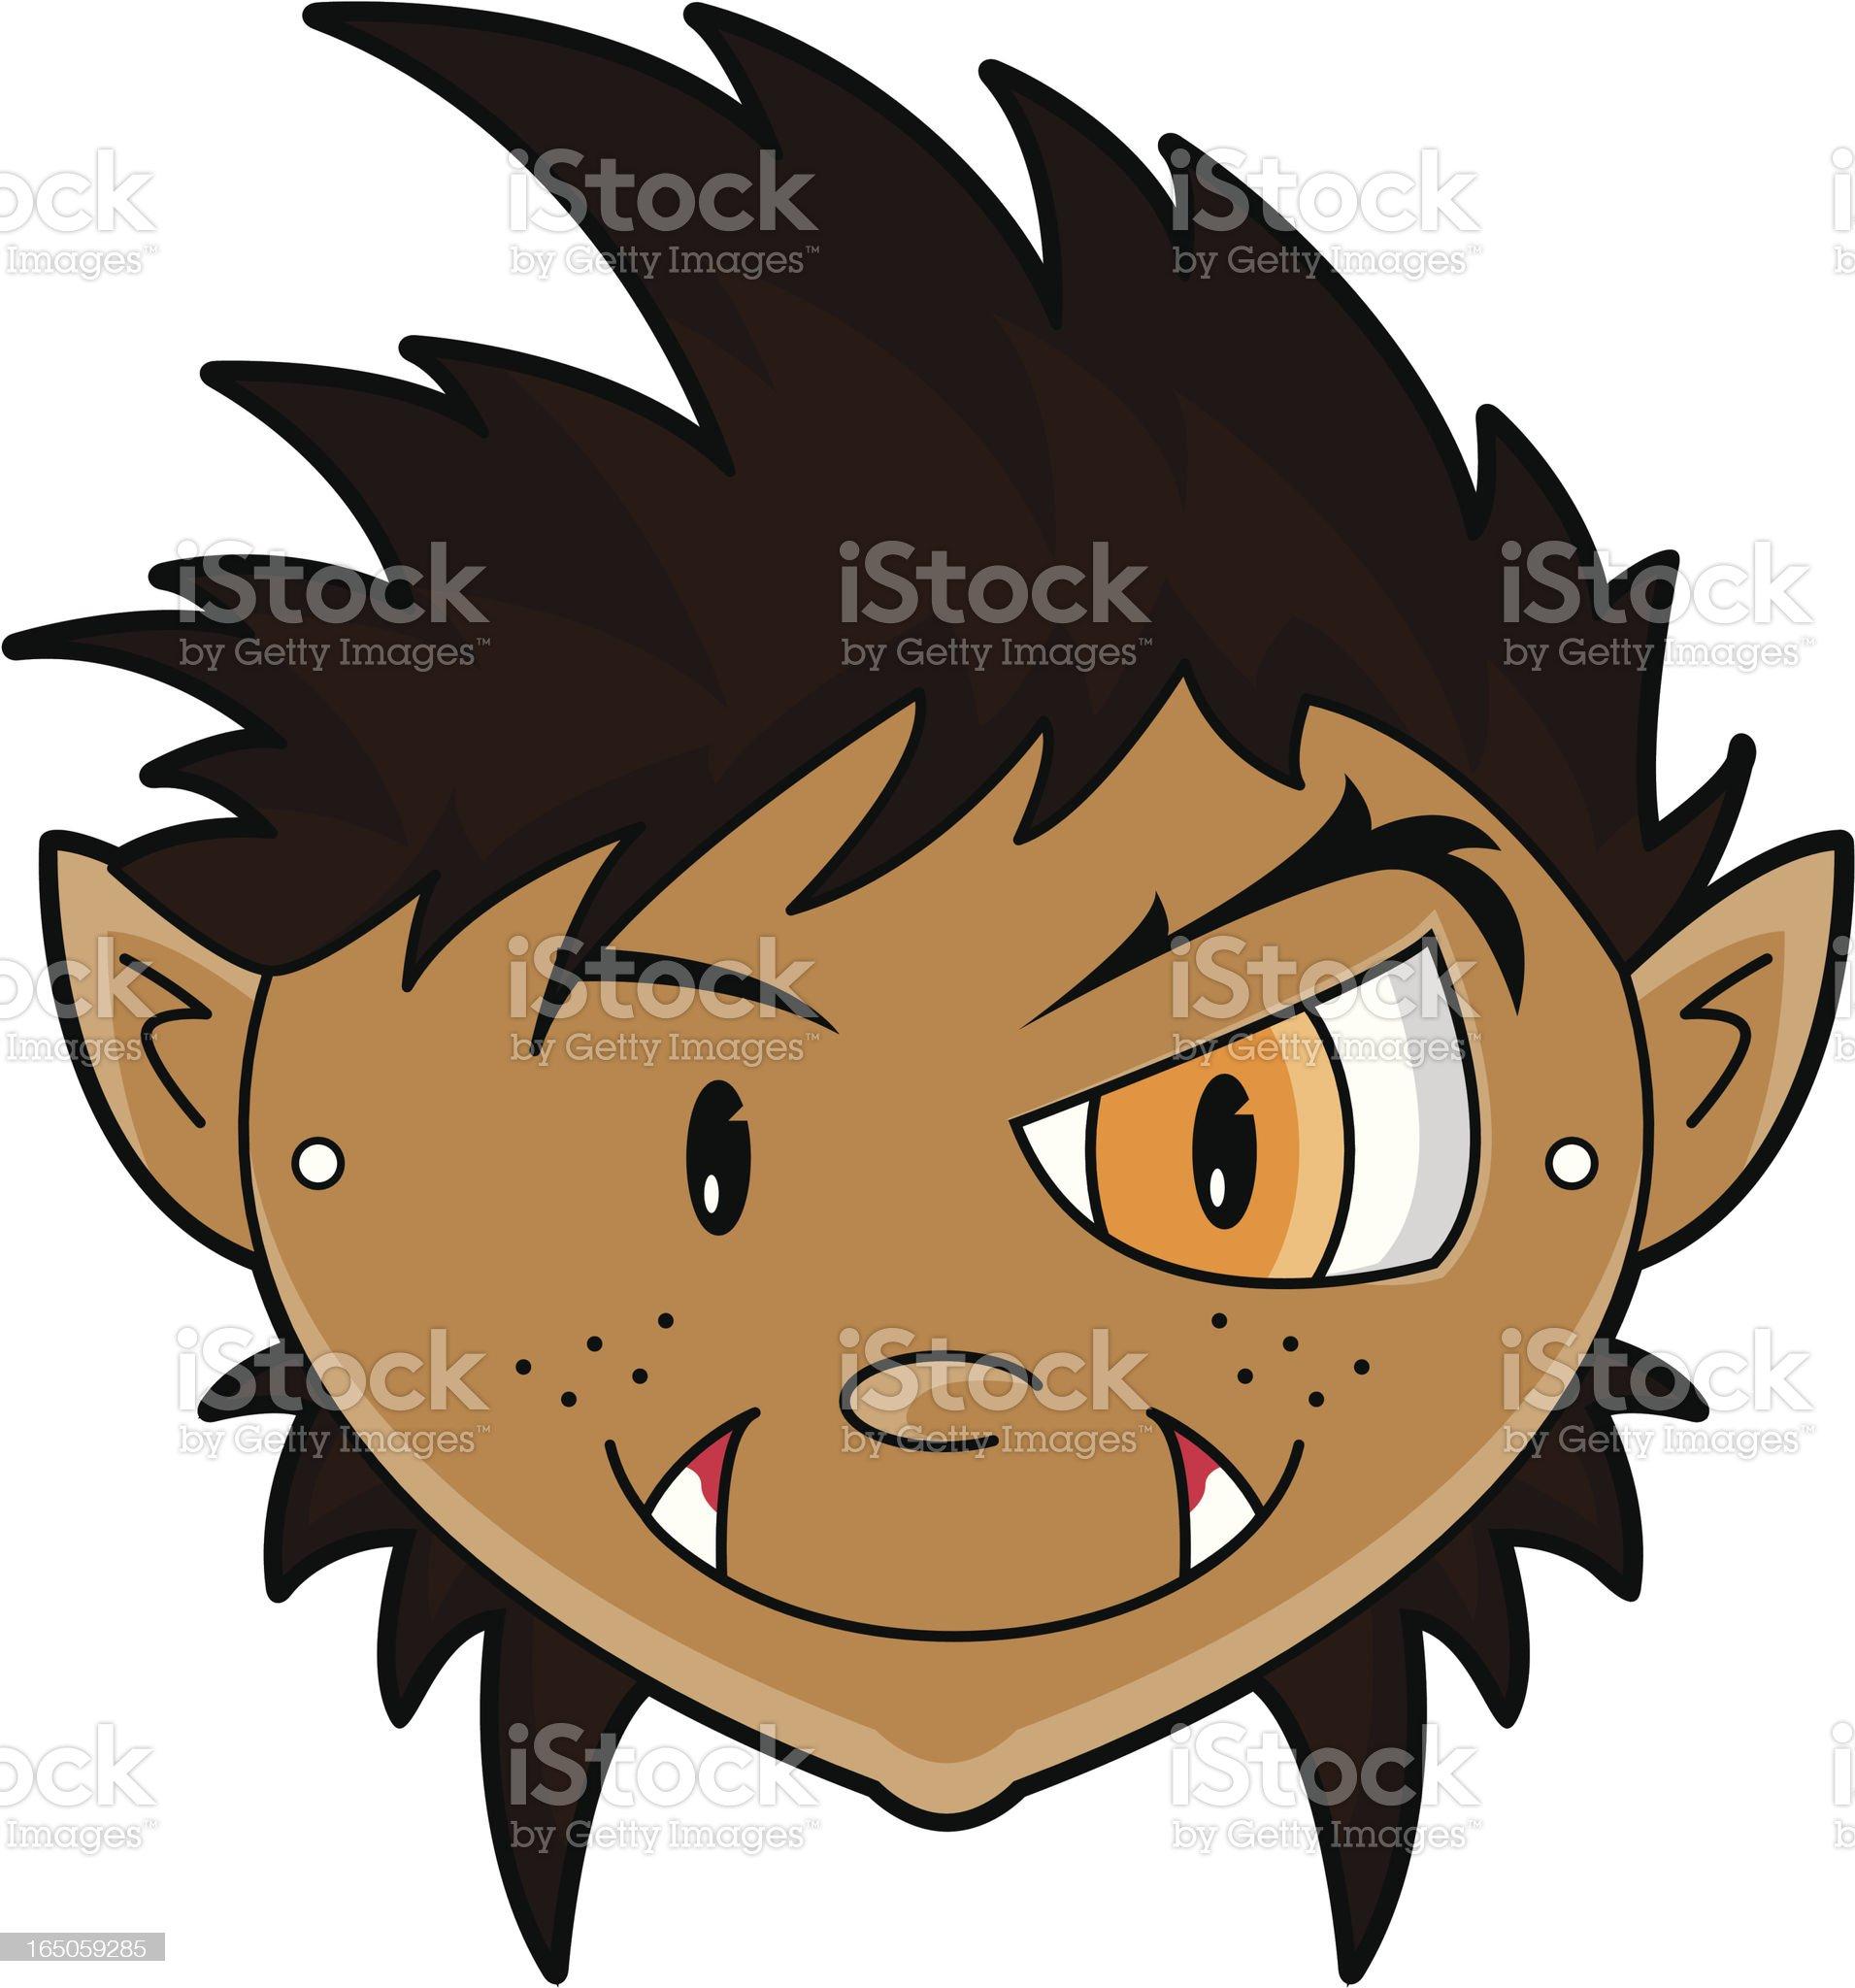 Werewolf Children's Paper Mask royalty-free stock vector art